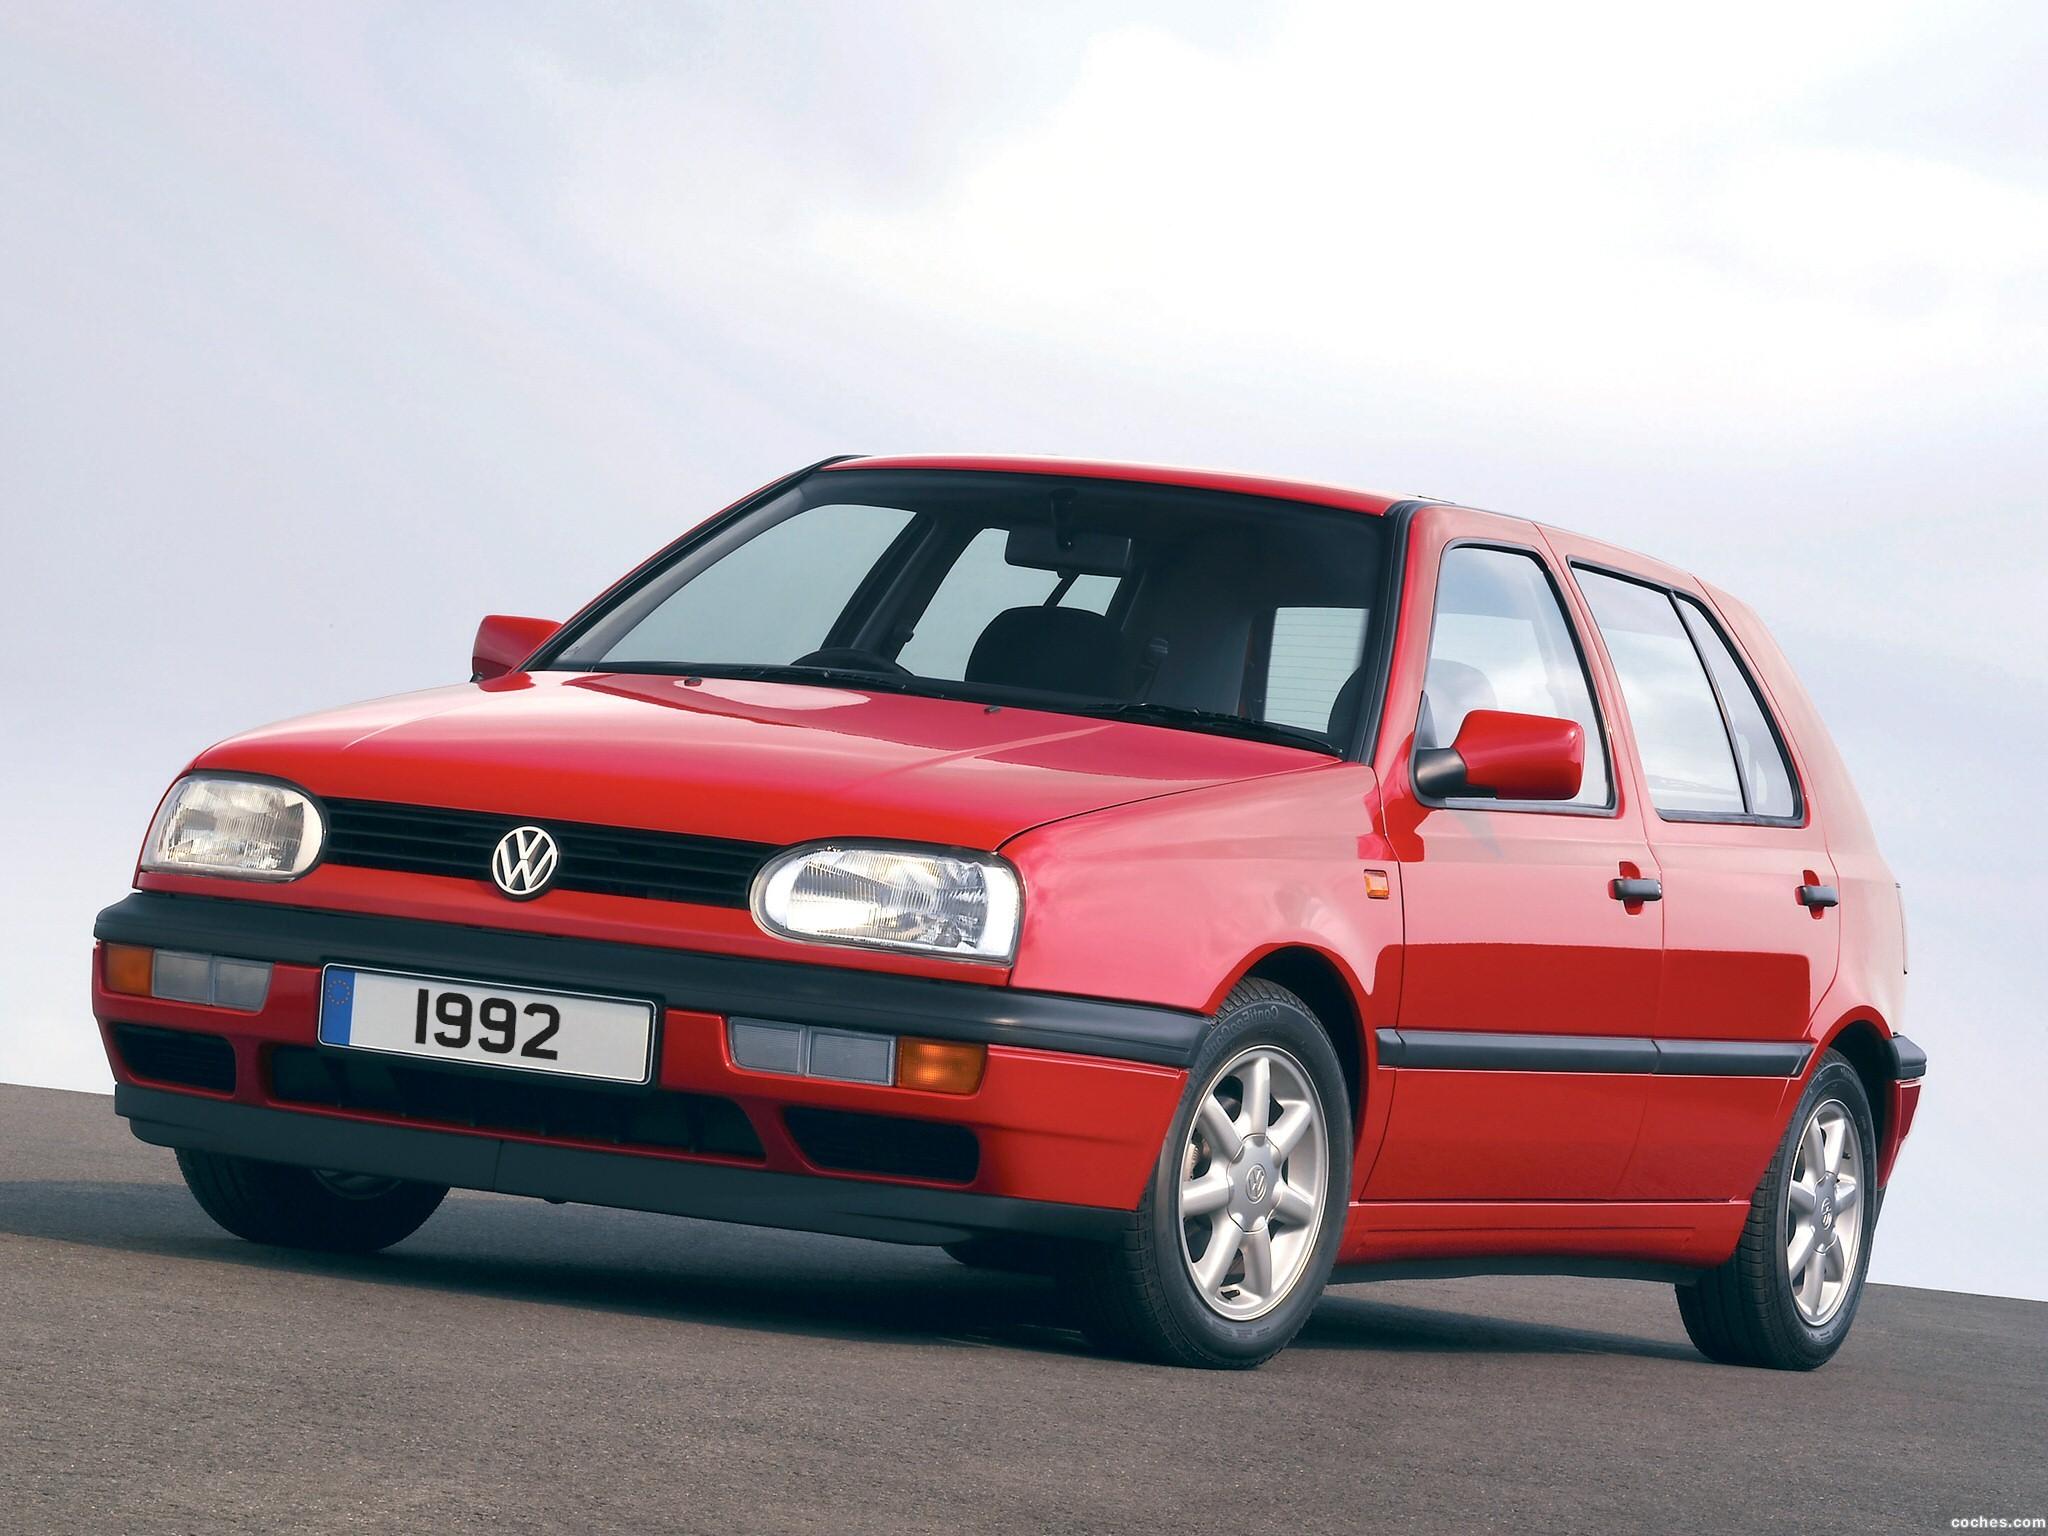 Vw Jetta Tdi Engine Intake further Volkswagen Golf Mk3 furthermore VW Golf 3 GTI 25 161686634 moreover 63882 together with 2004 Corvette z06  memorative edition. on 1991 vw golf gti vr6